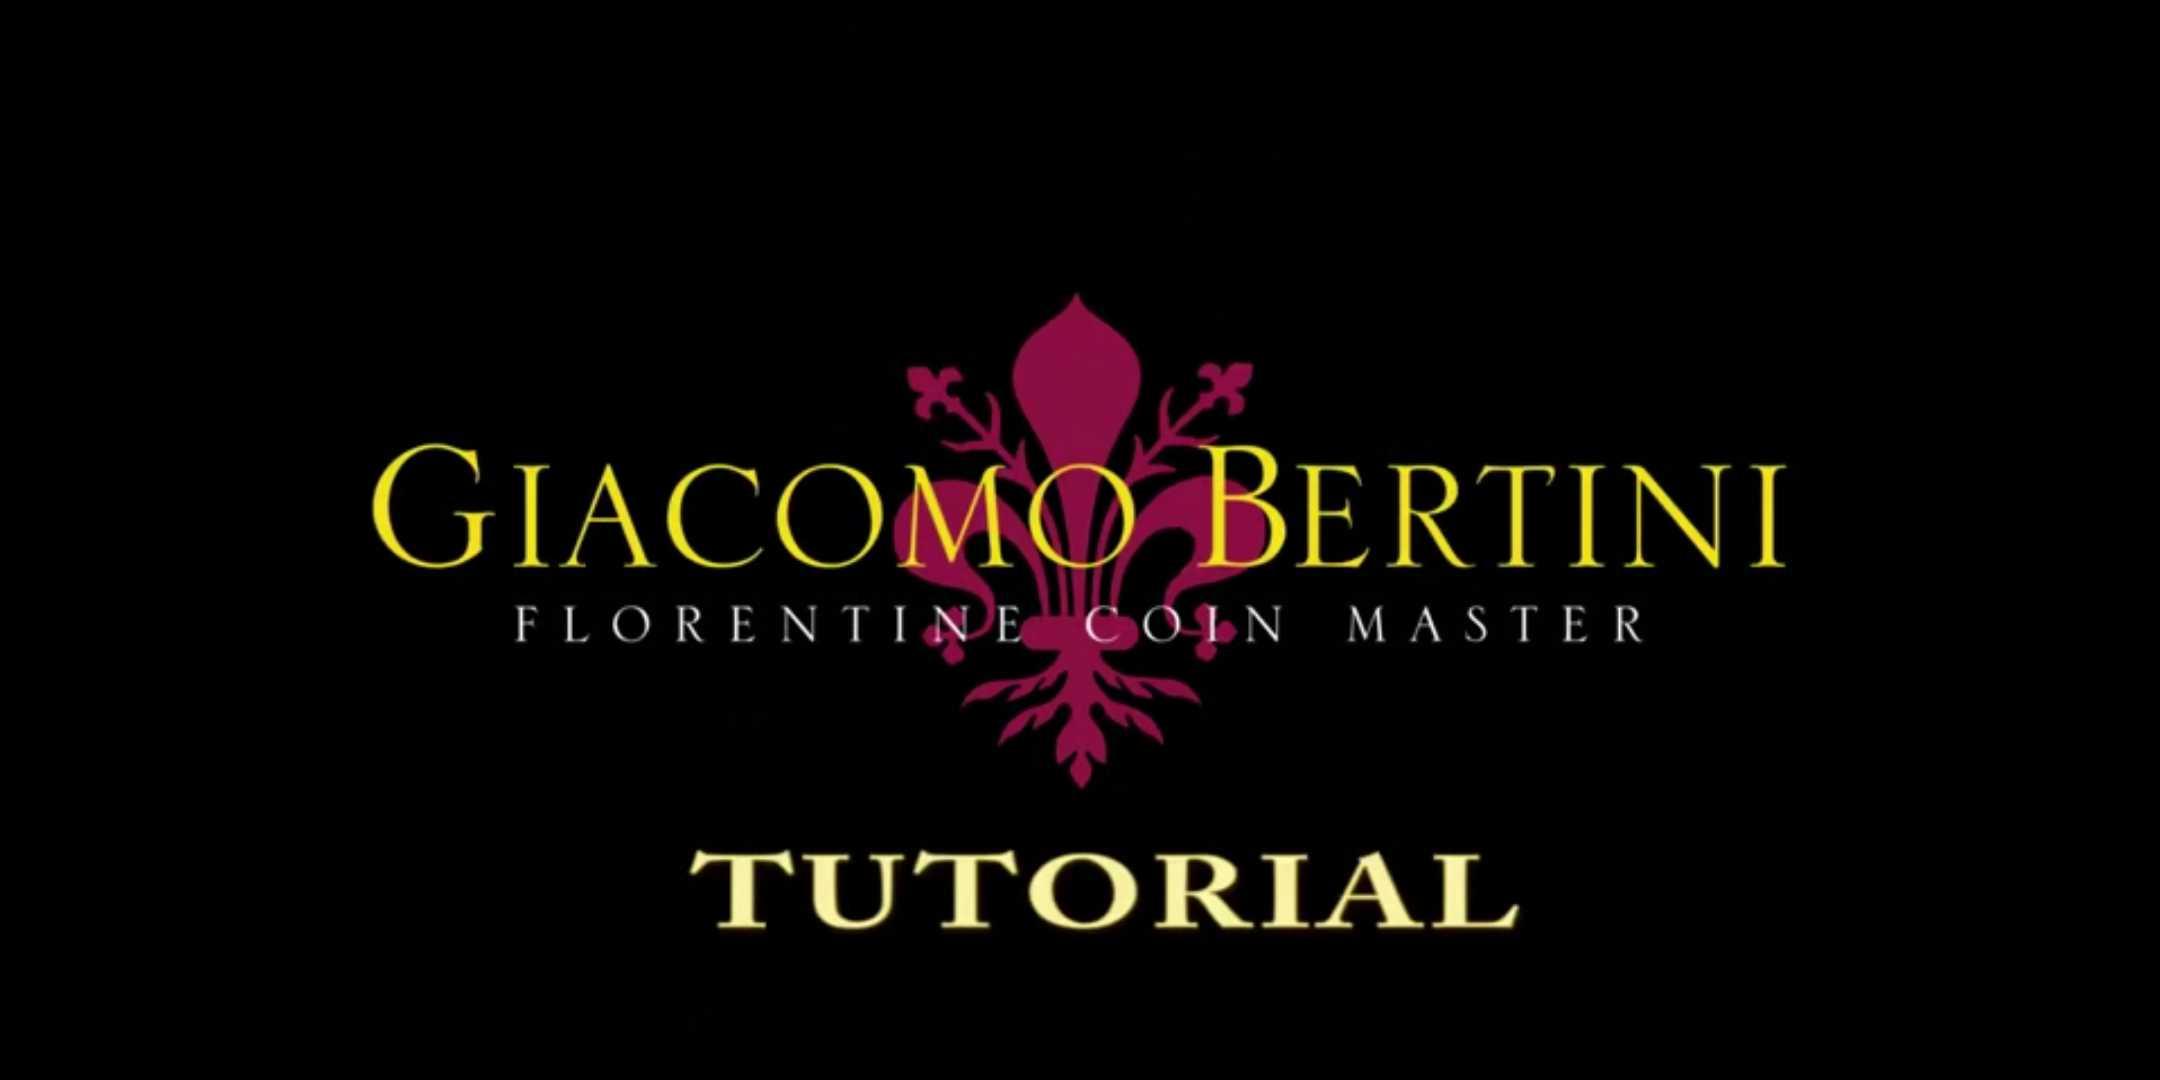 Spellbound By Giacomo Bertini Magic Instructions  Magic Trick